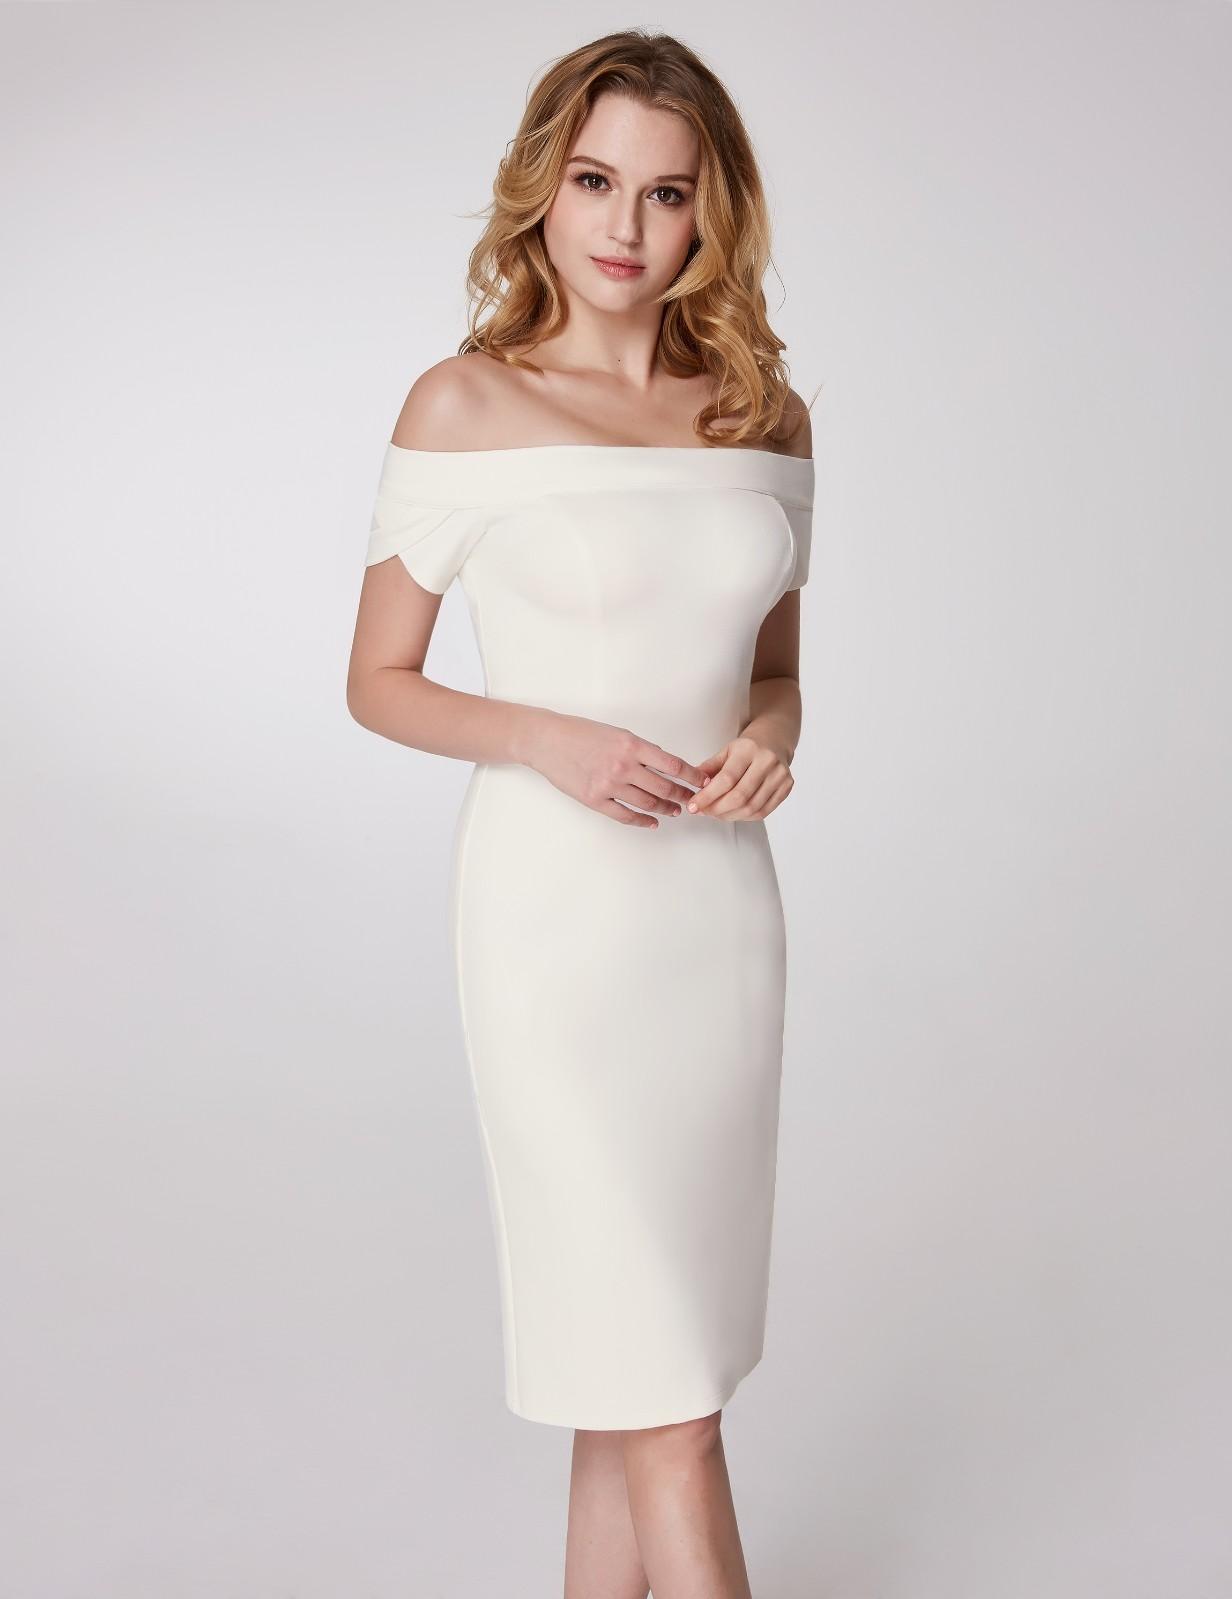 2a84e145ab02 Ever-Pretty Evening Cocktail Party Dresses White Off Shoulder OL ...